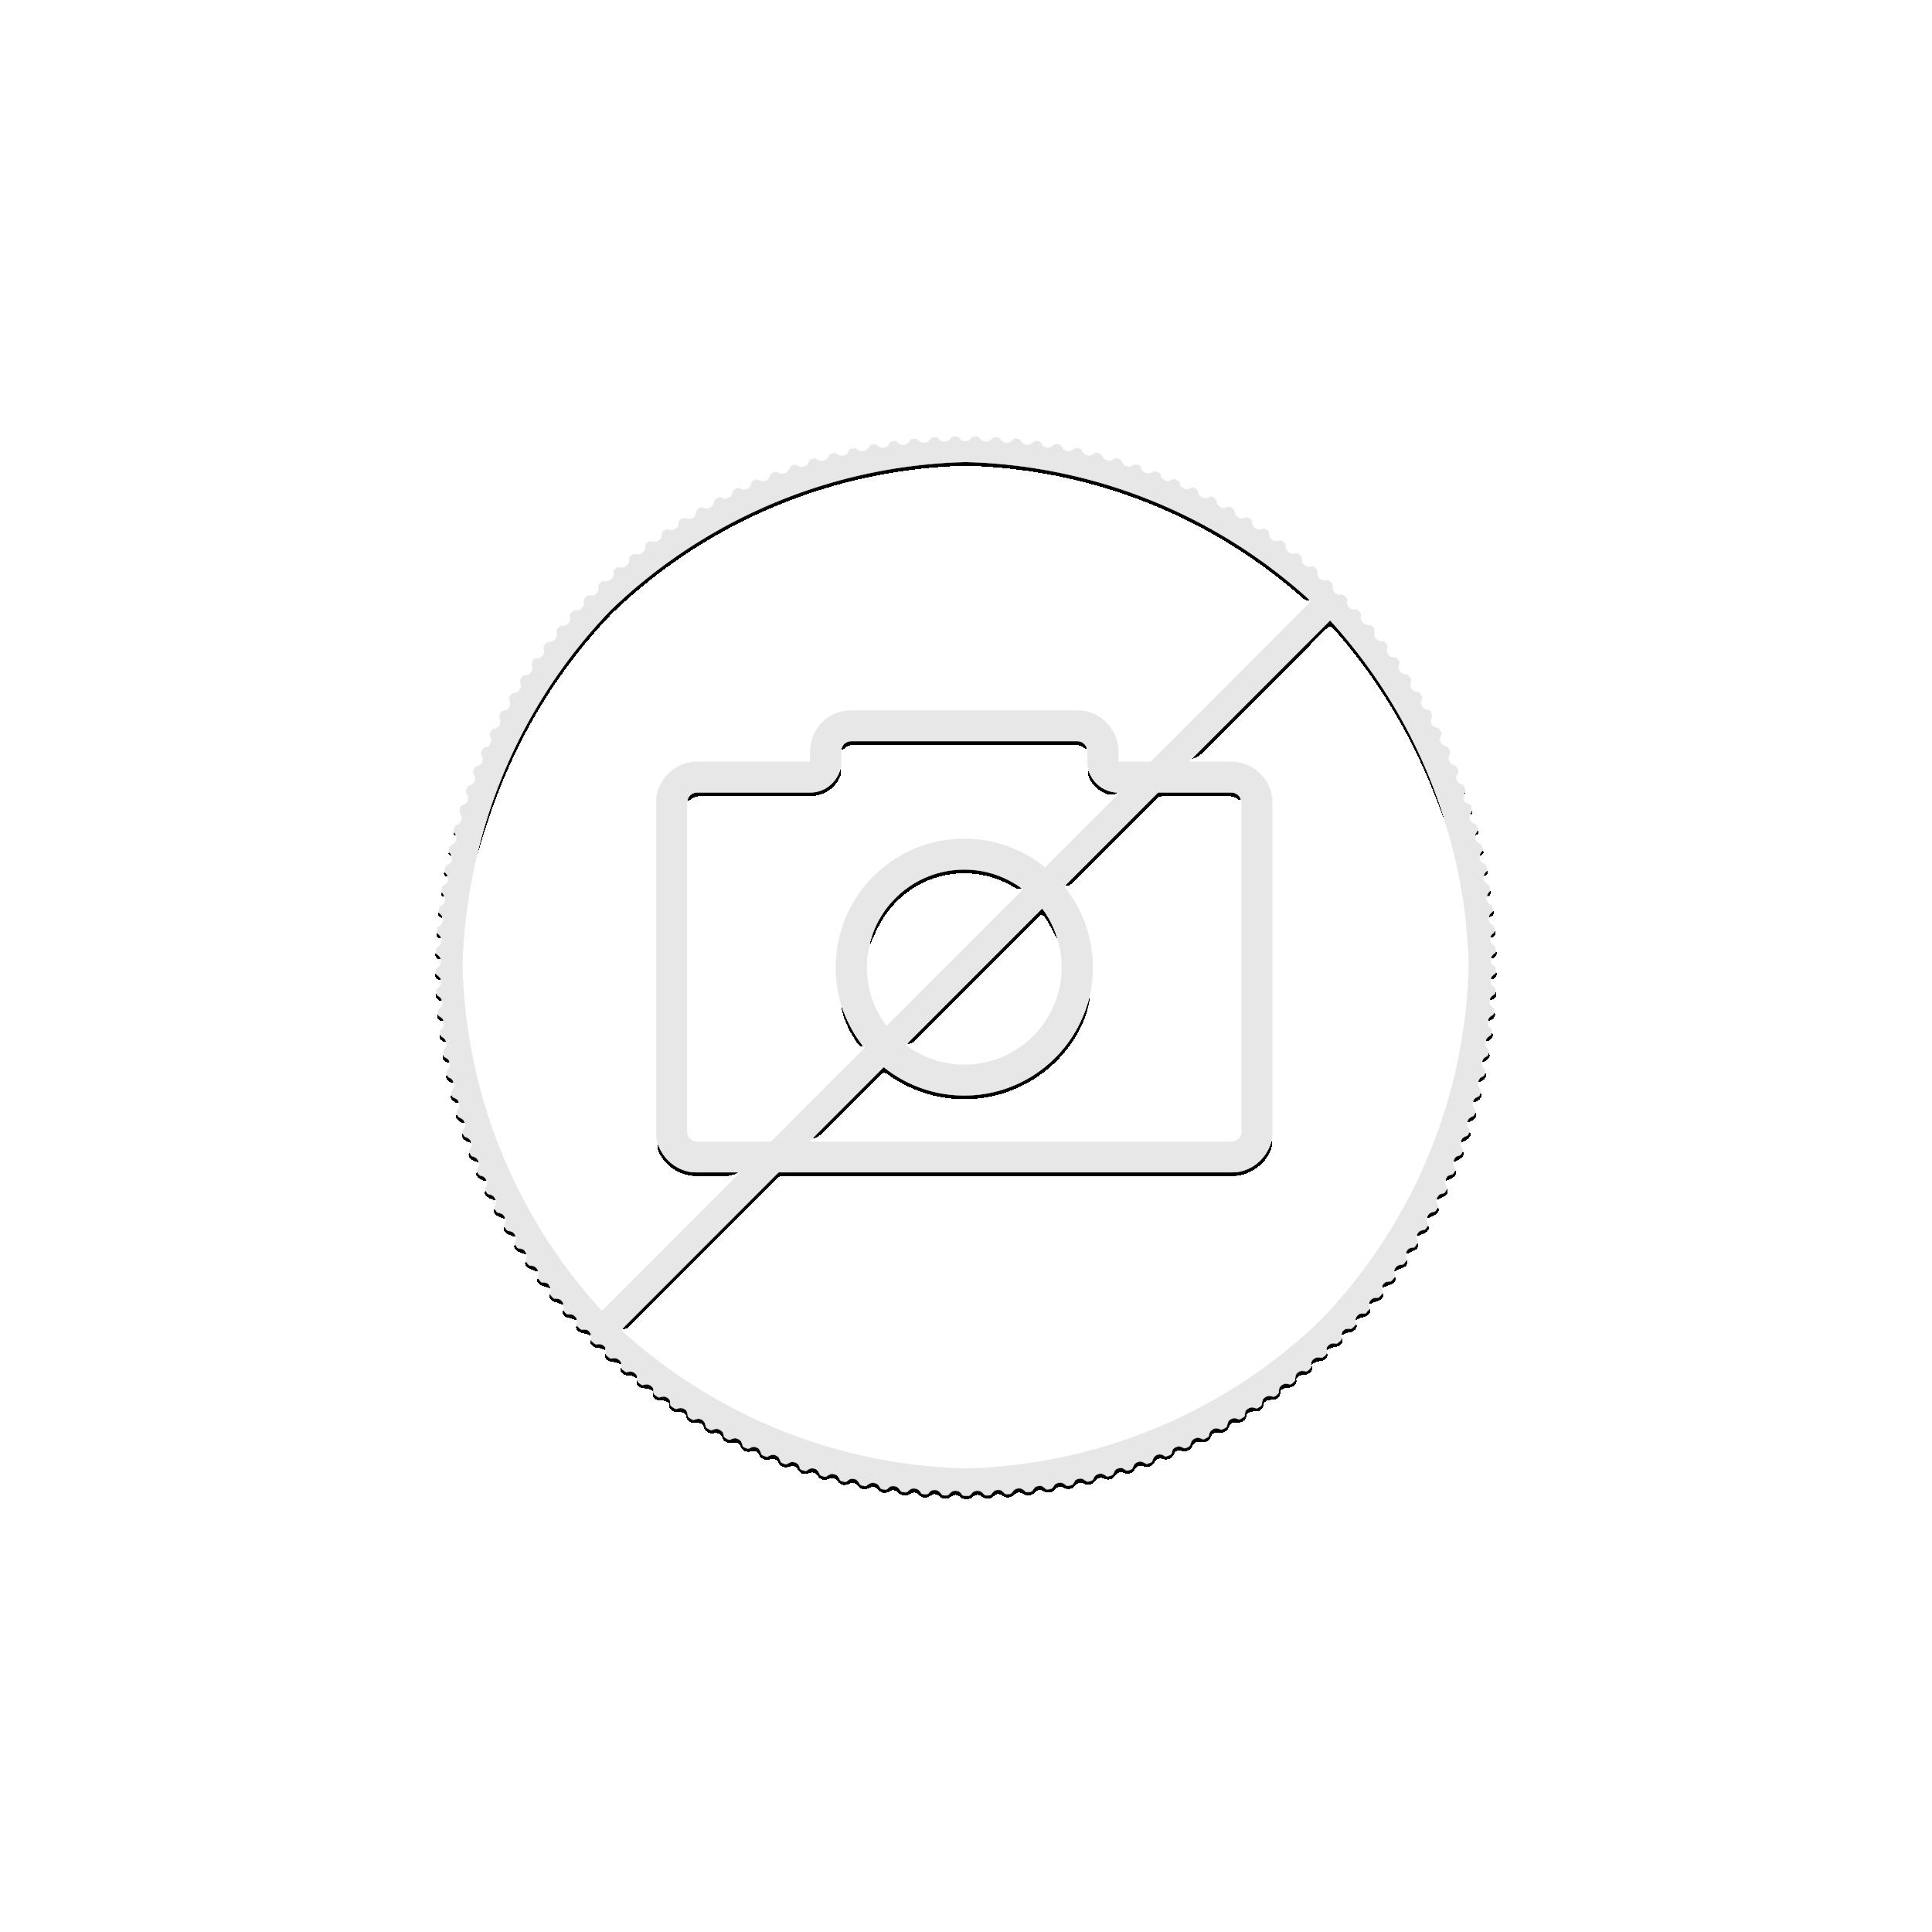 1 Troy ounce silver coin Kookaburra 2019 ANDA coin fair